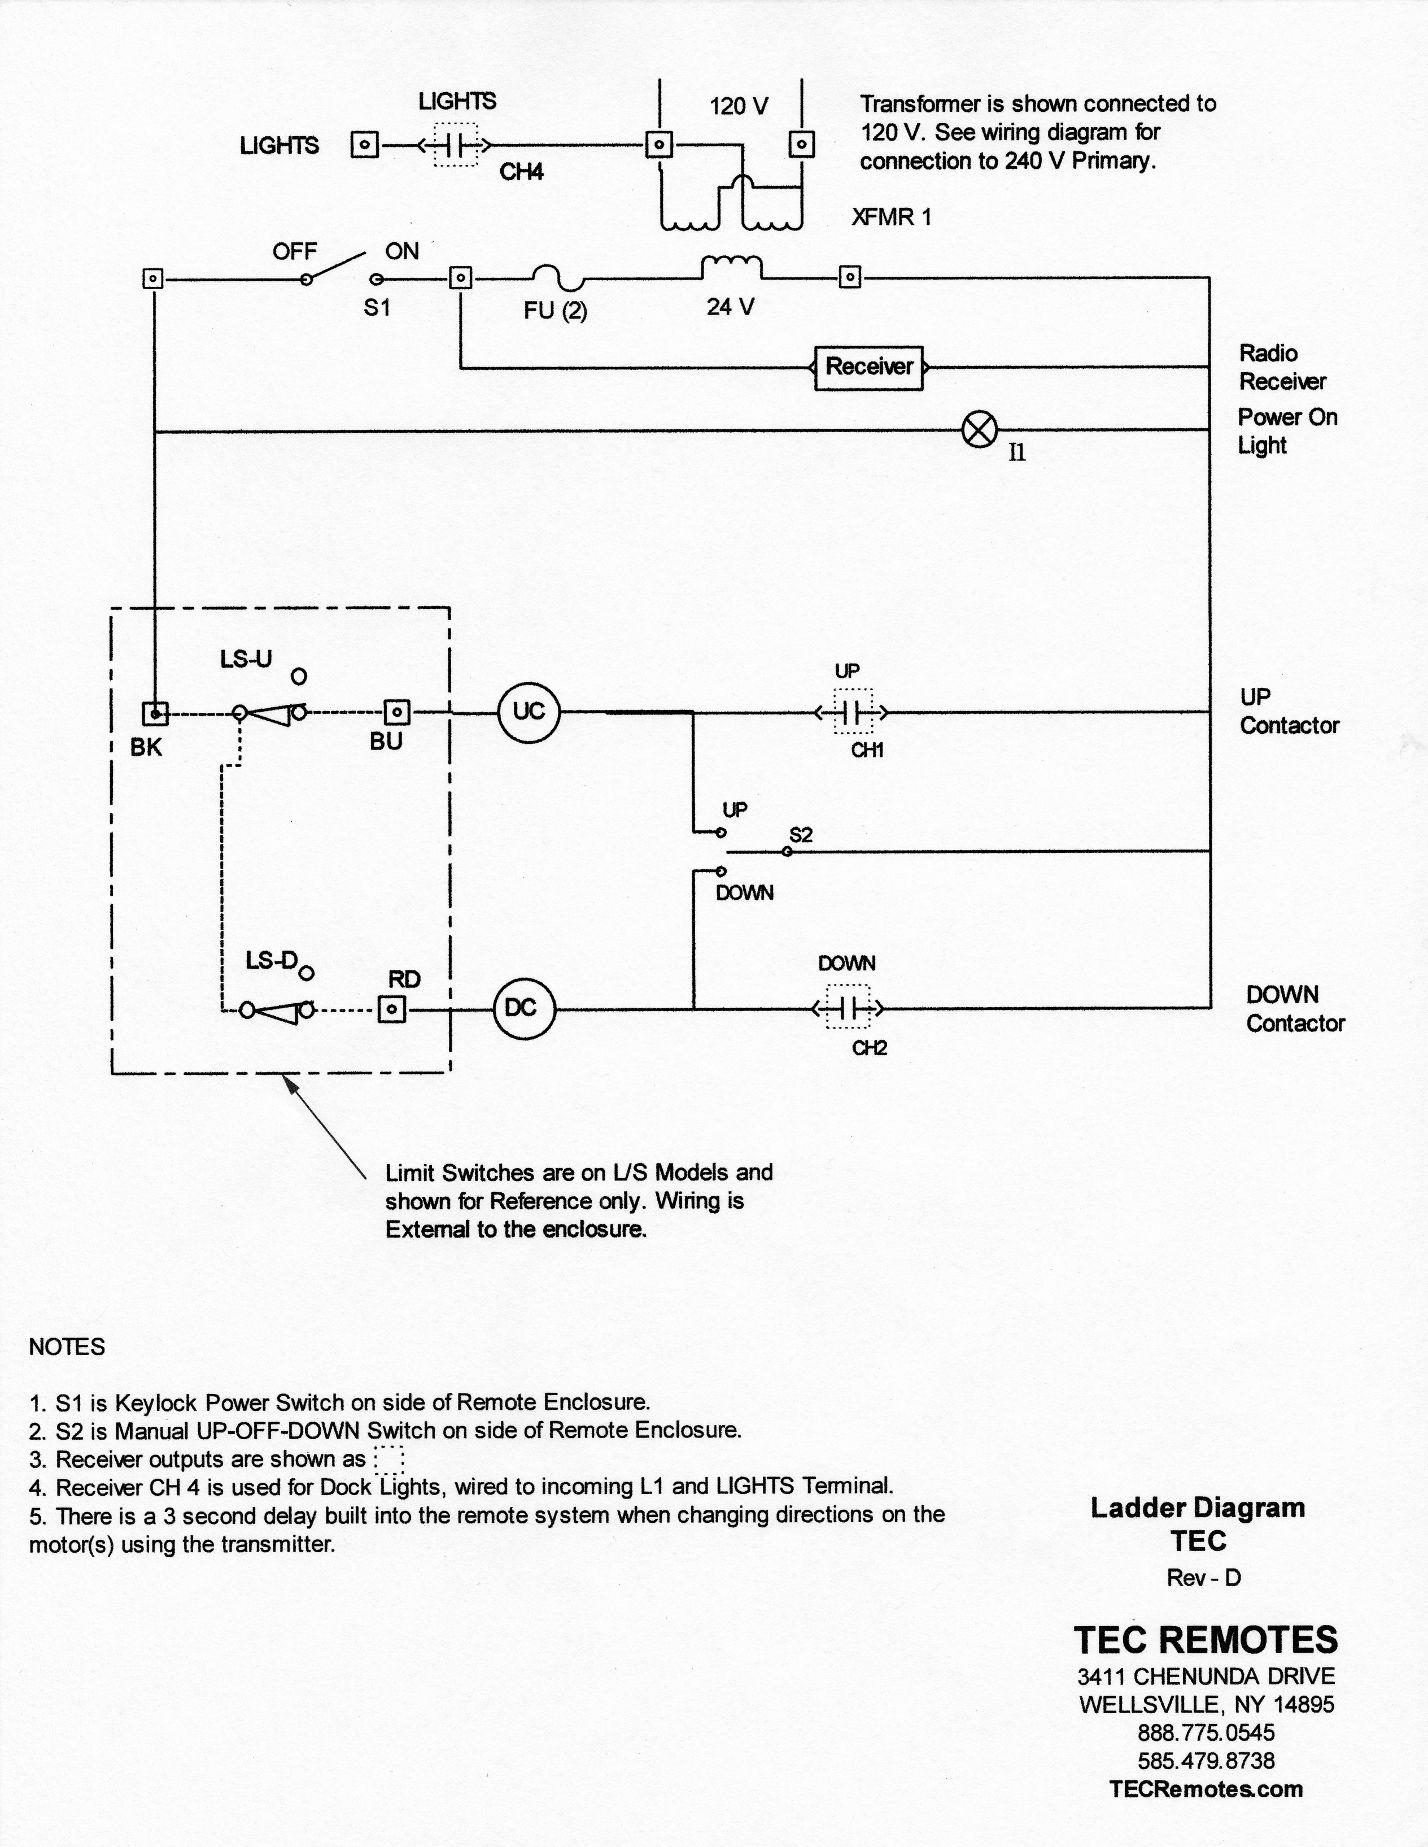 maxum boat wiring diagram wiring diagram boat trailer wiring harness proline fishing boat diagram new era of wiring diagram \\u2022robalo wiring diagram mg td wiring